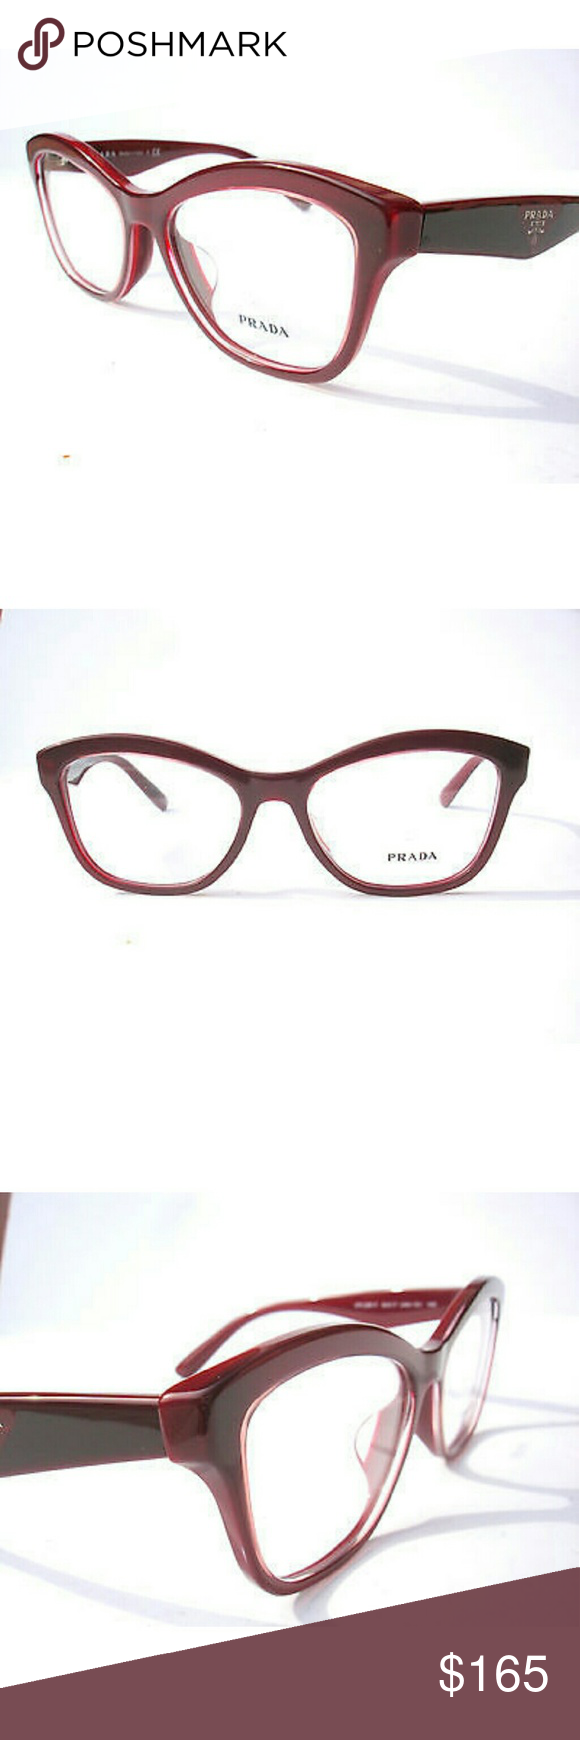 75f7e573c31f Prada Eyeglasses New Prada Eyeglasses Burgundy frame Size 54-17-140  Includes Chanel case Prada Accessories Glasses